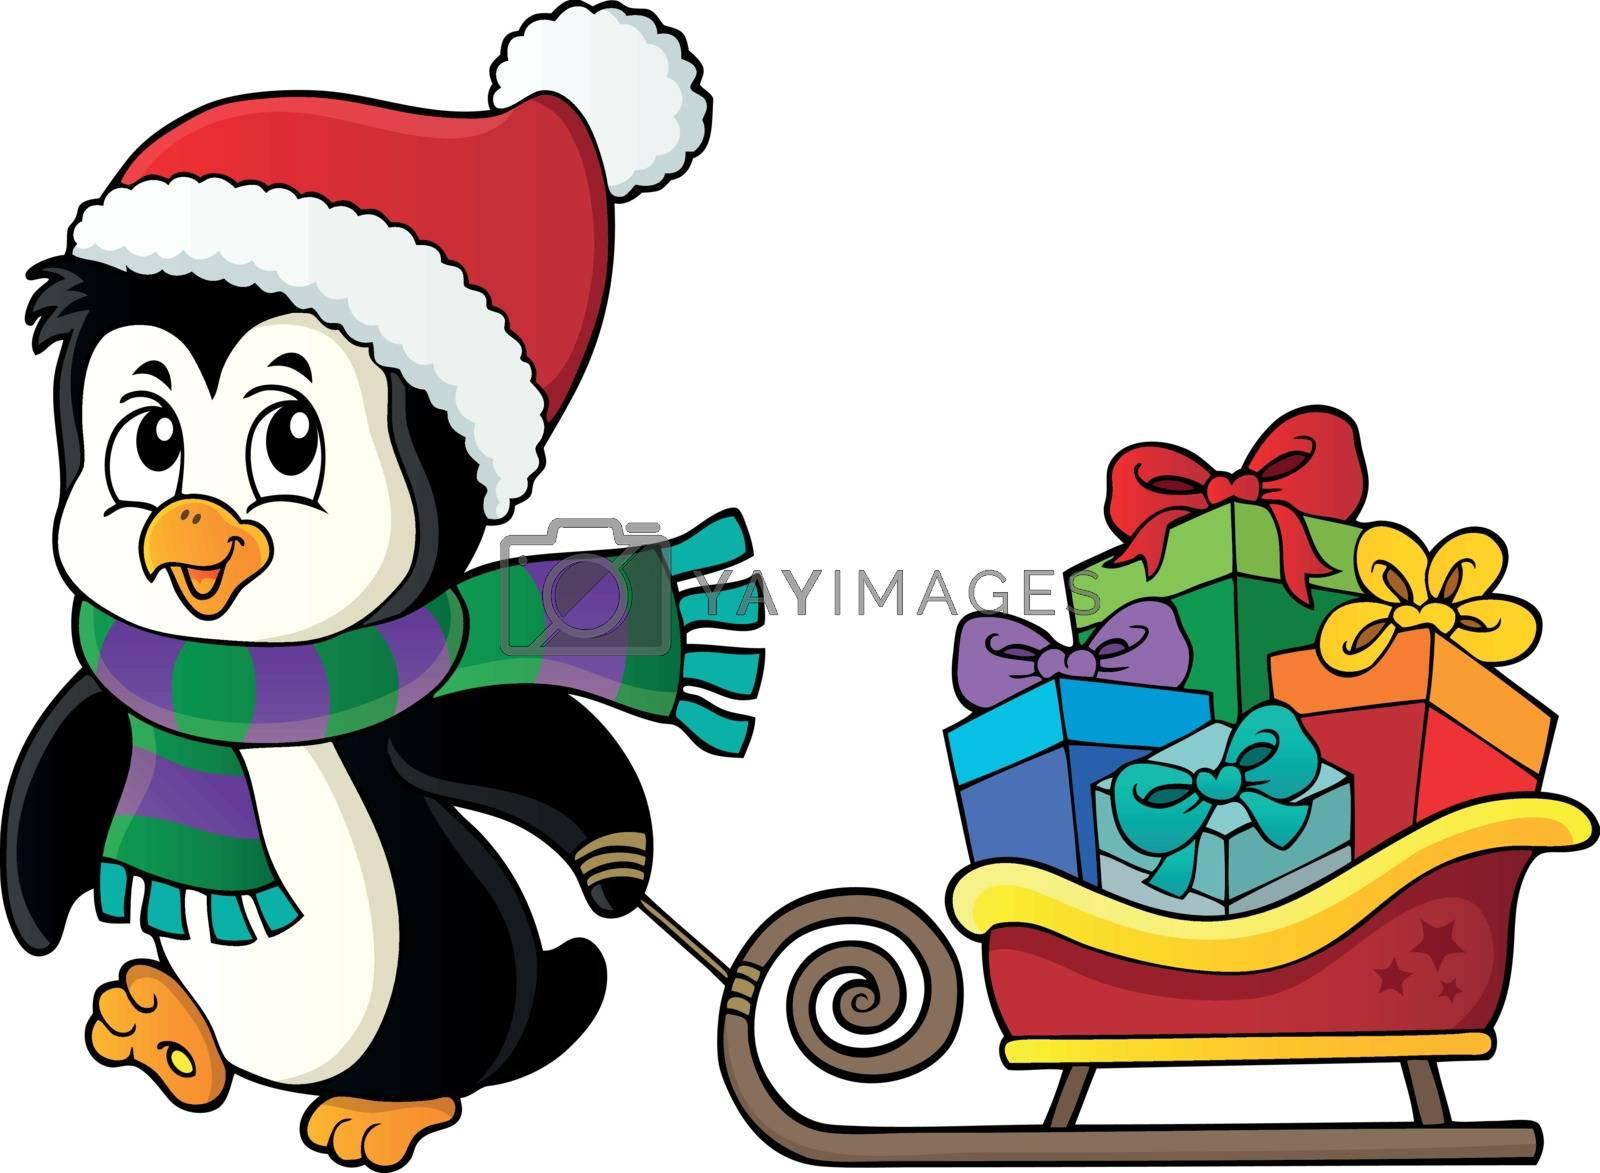 Christmas penguin with sledge image 3 - eps10 vector illustration.